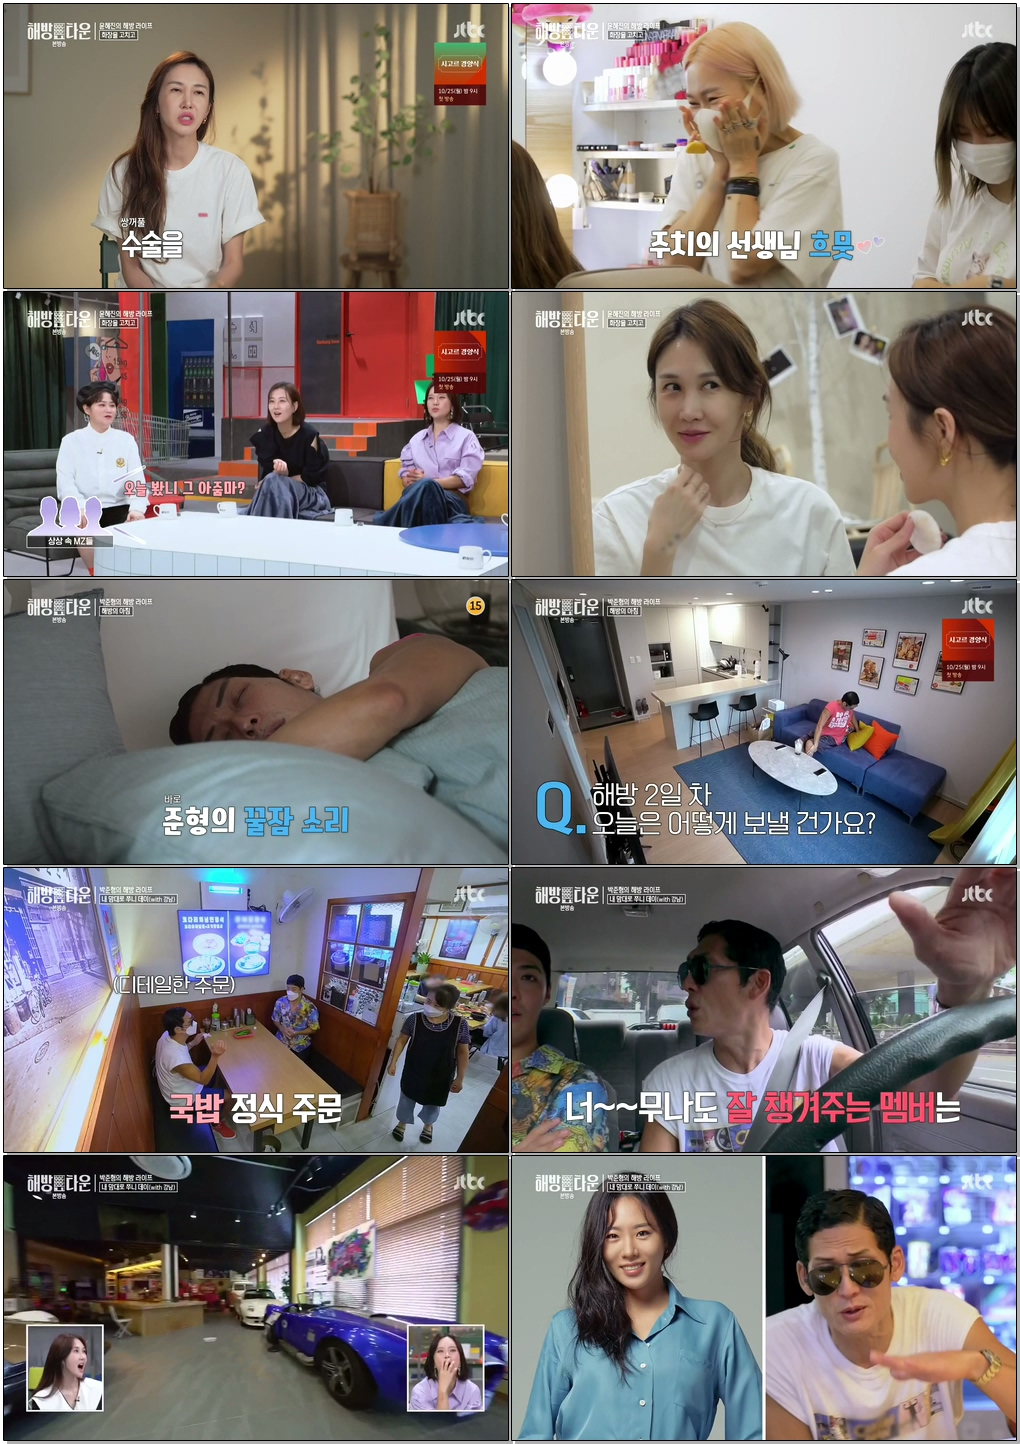 <b>[JTBC] 해방타운(윤혜진,박준형).E20.211015.720p-NEXT</b>